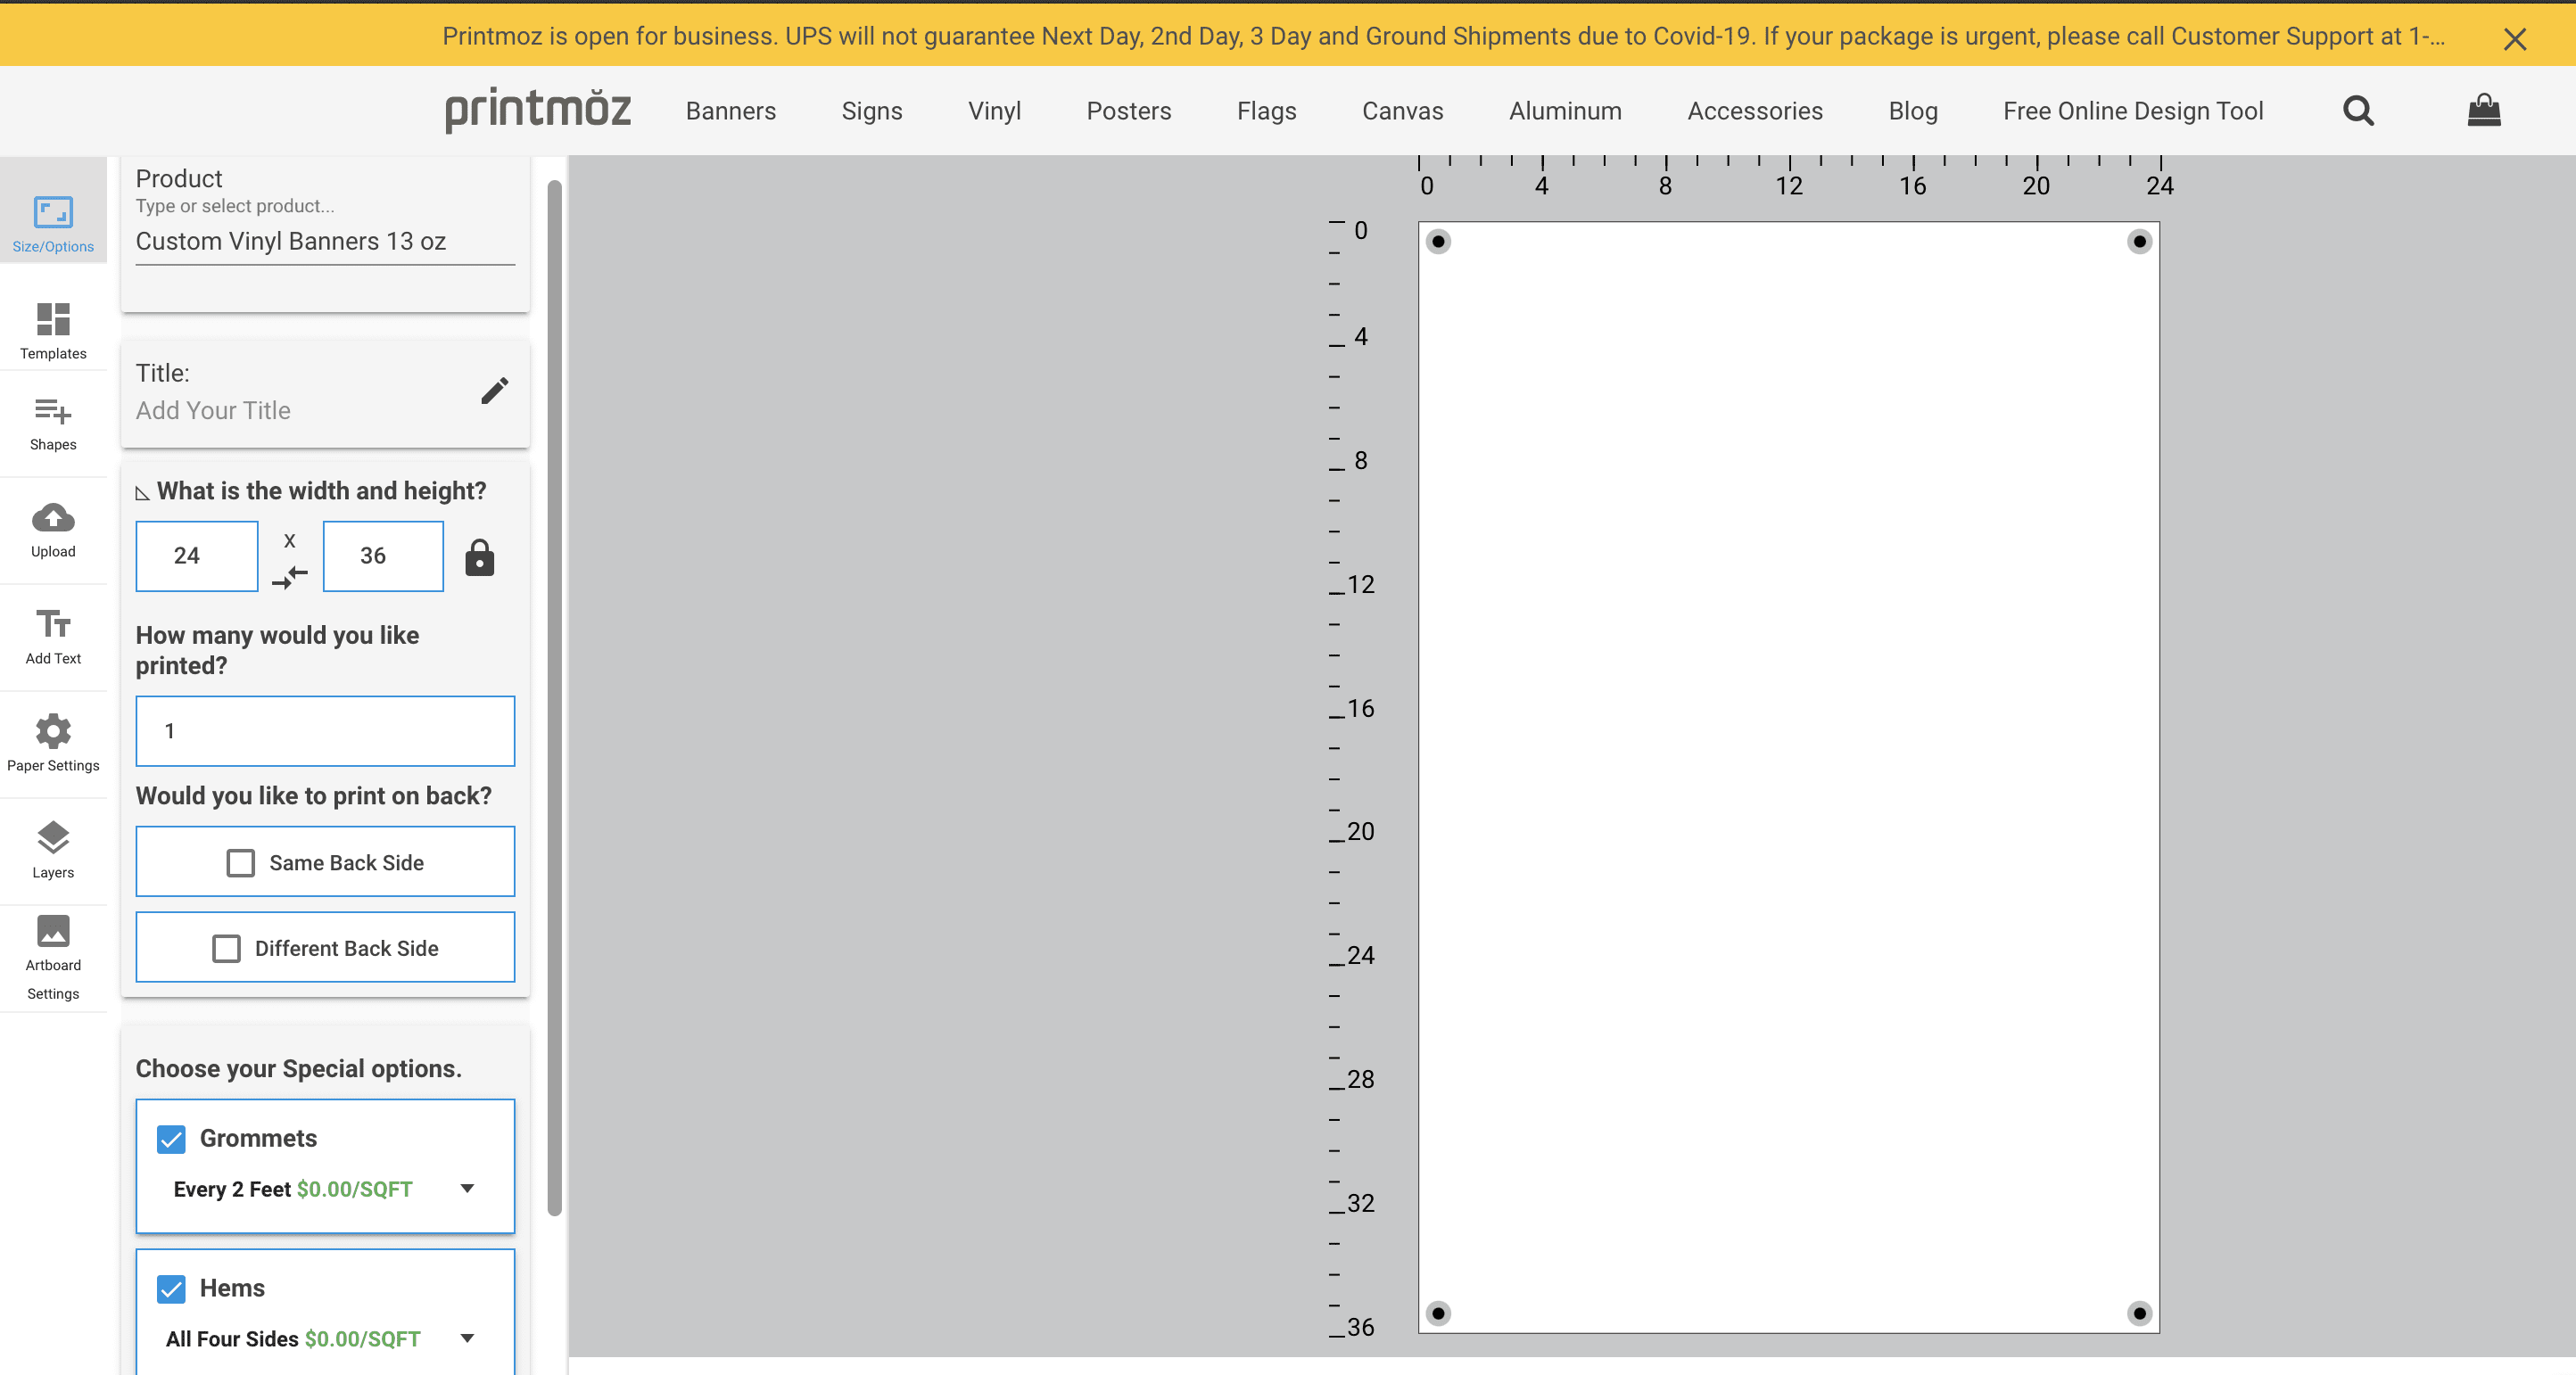 online design tool options